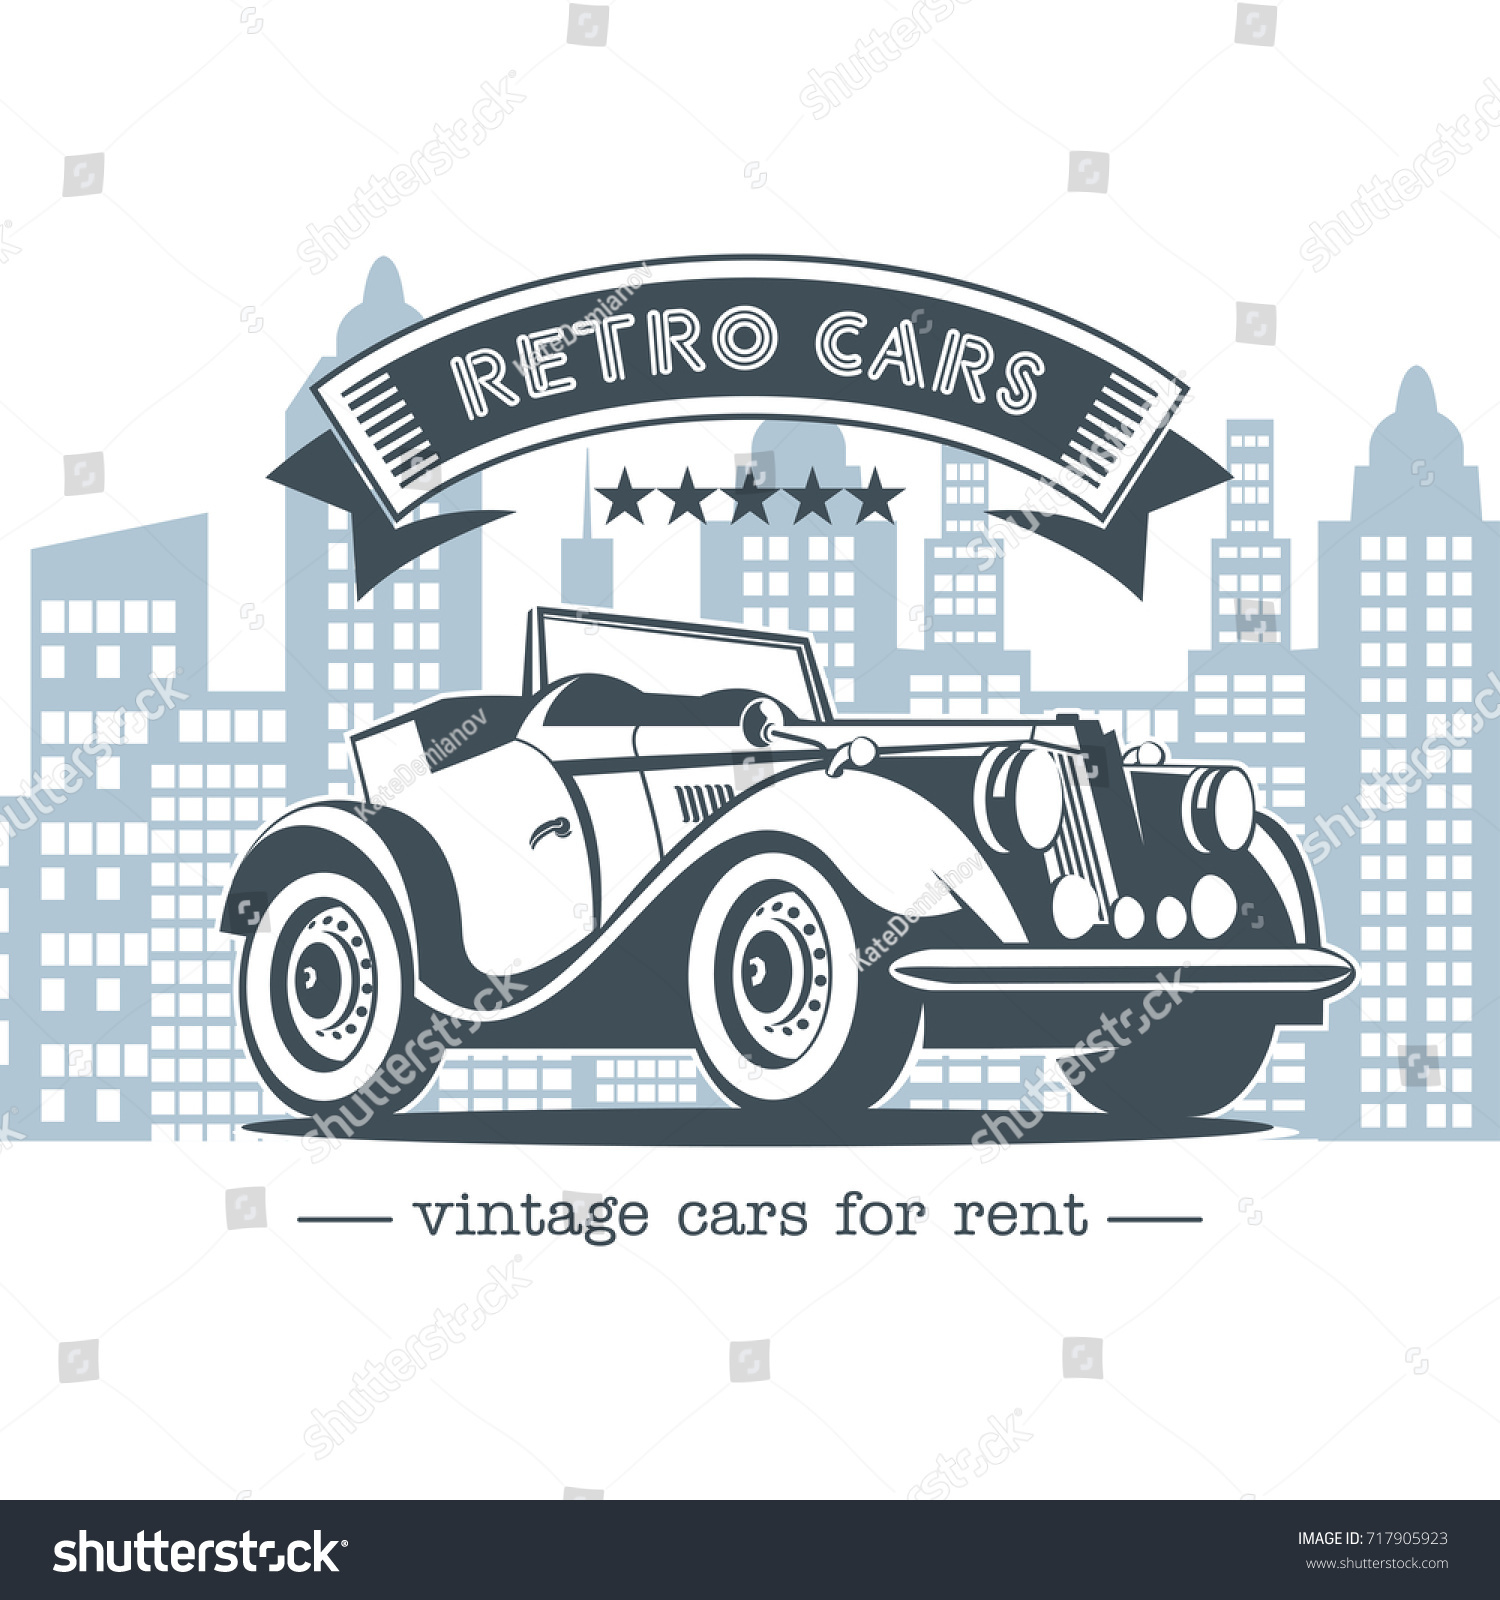 Vintage Car Retro Cars Rent Monochrome Stock Photo (Photo, Vector ...